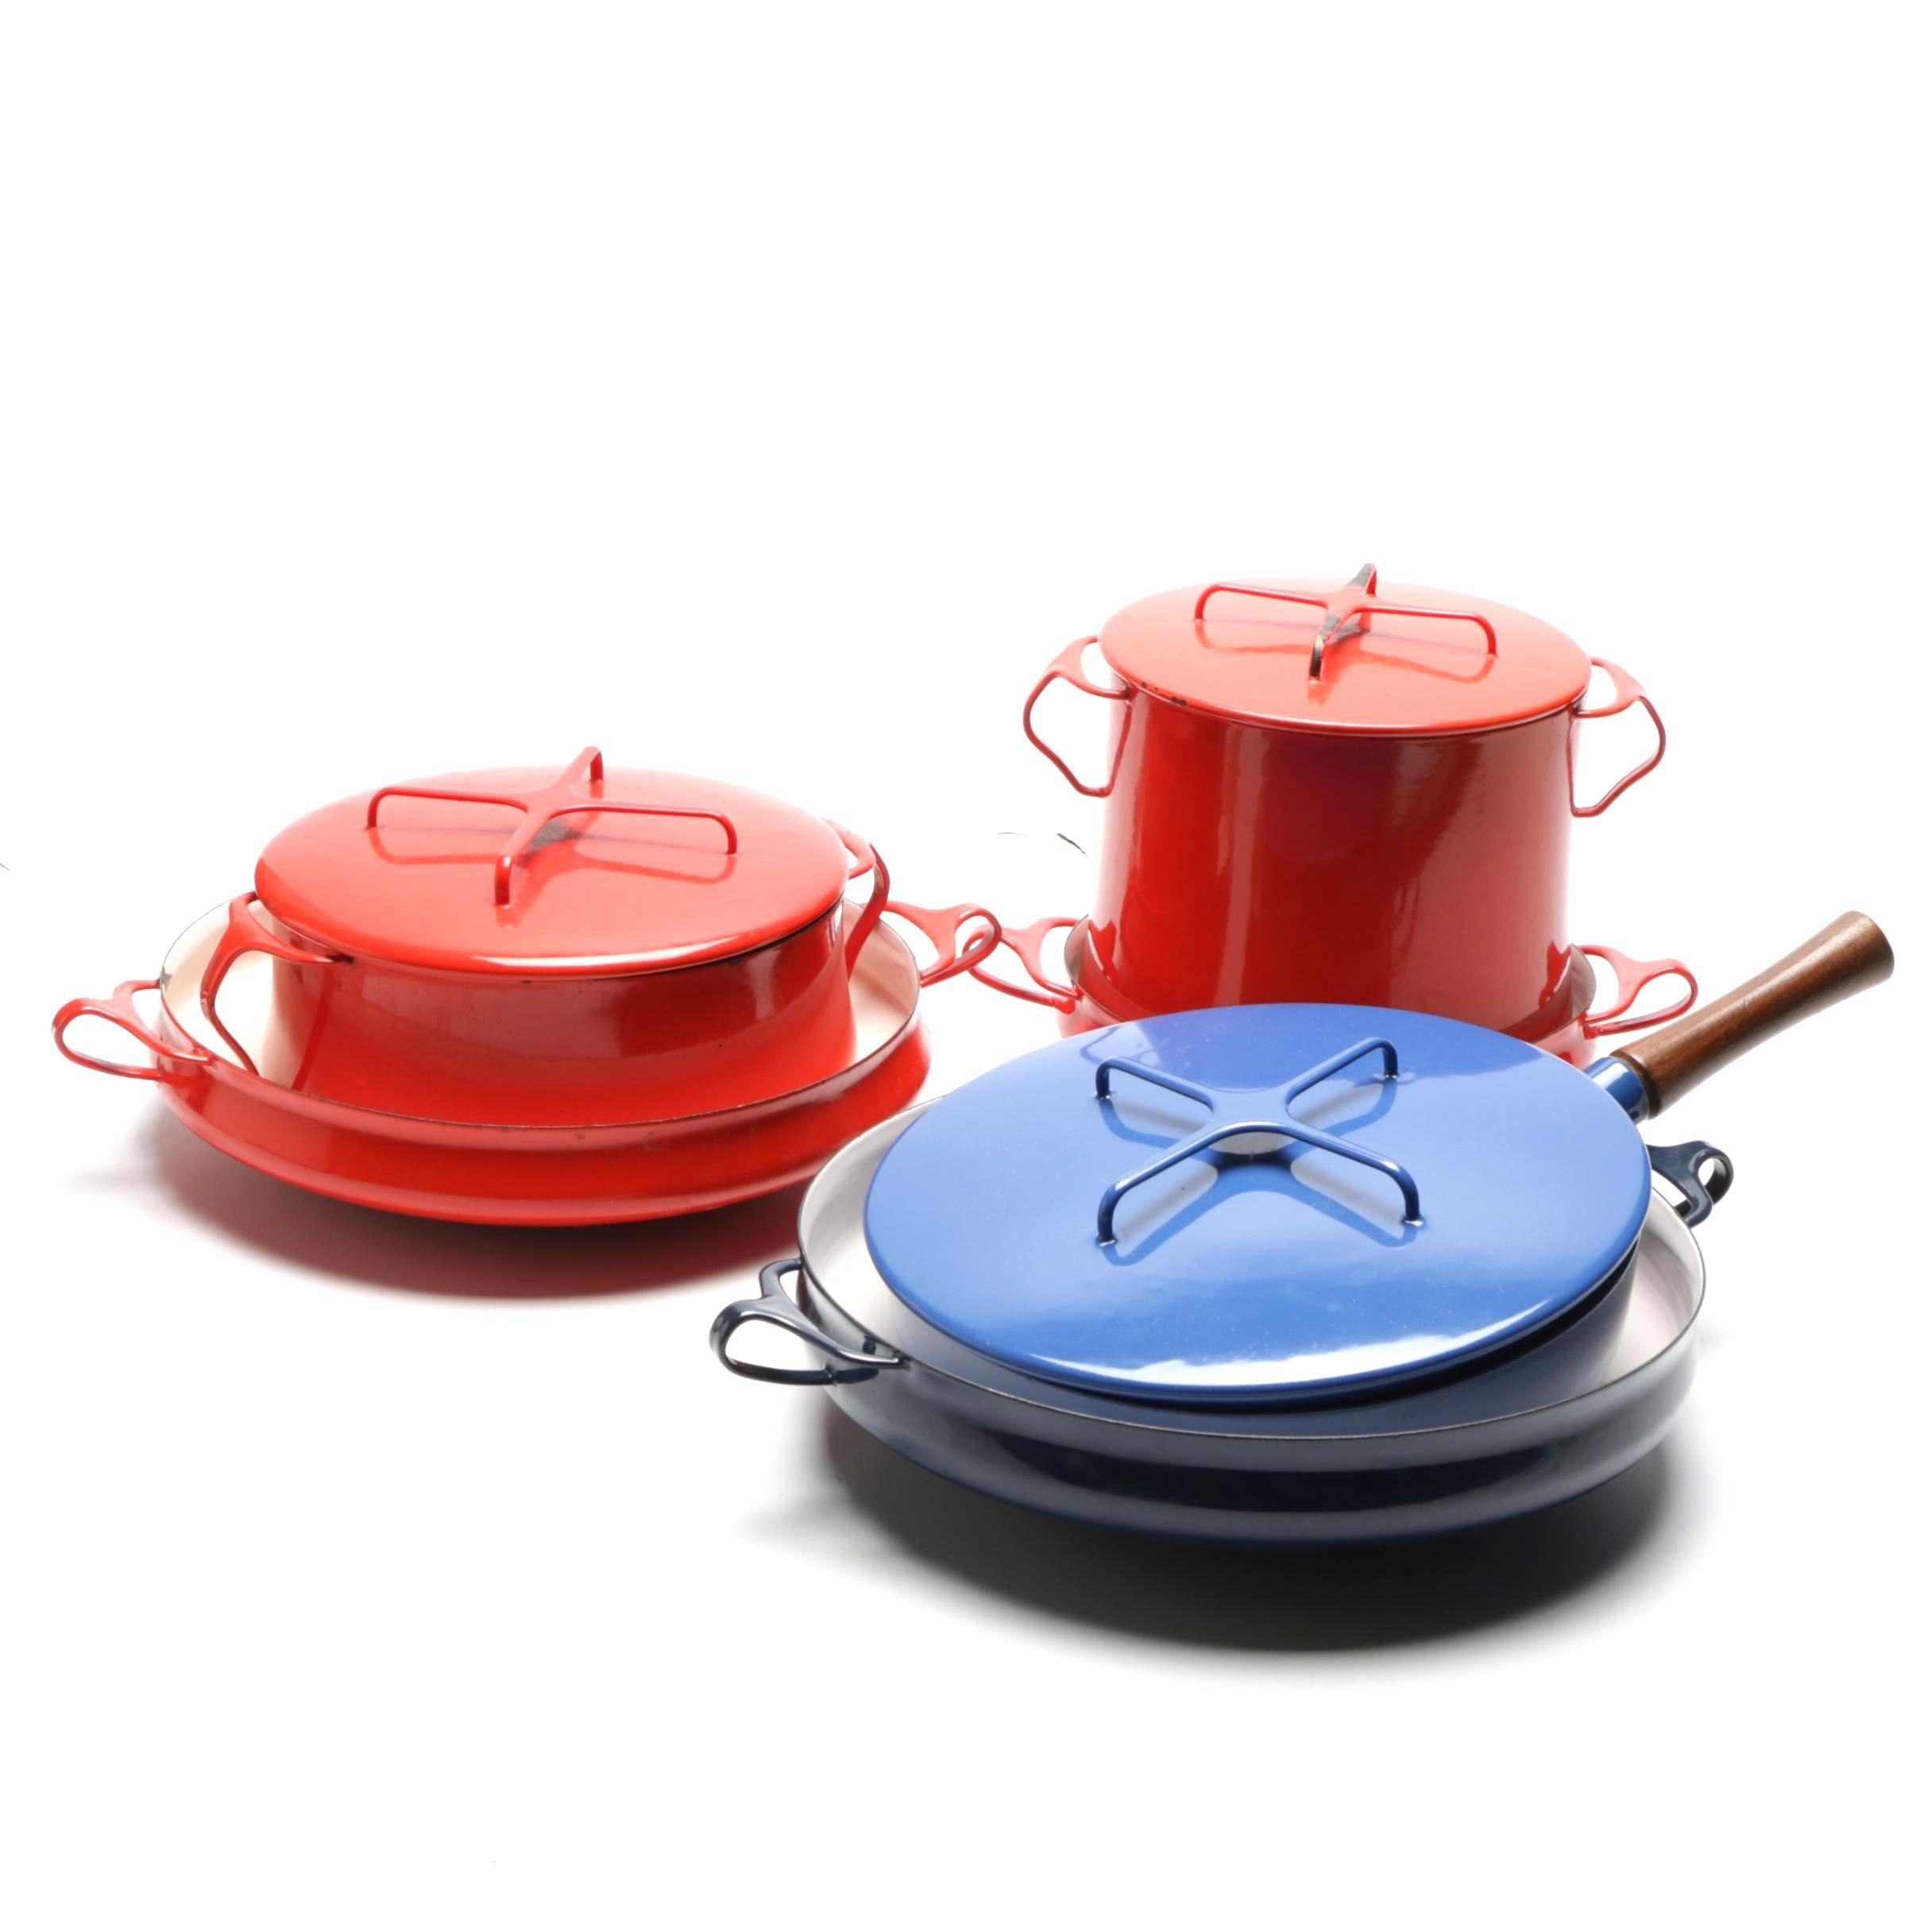 Dansk Kobenstyle Enamel Cookware in Red and Blue